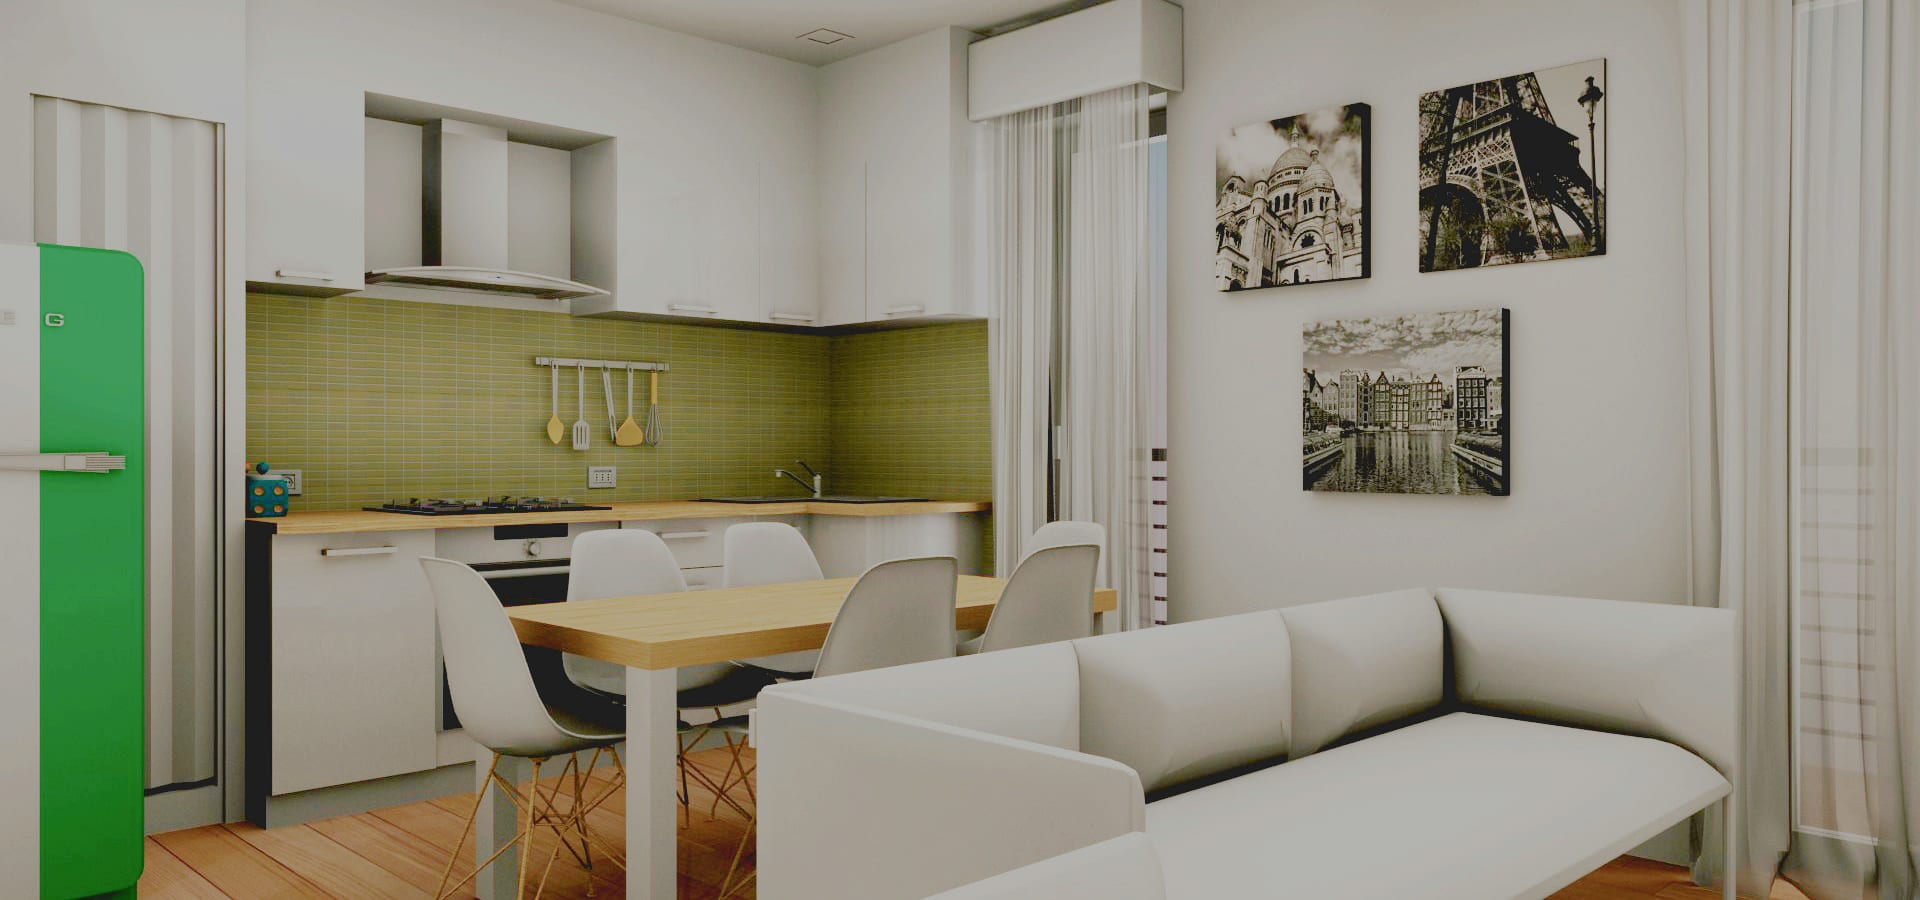 Italian Home Renovation—Interior Design & Property Refurbishment -